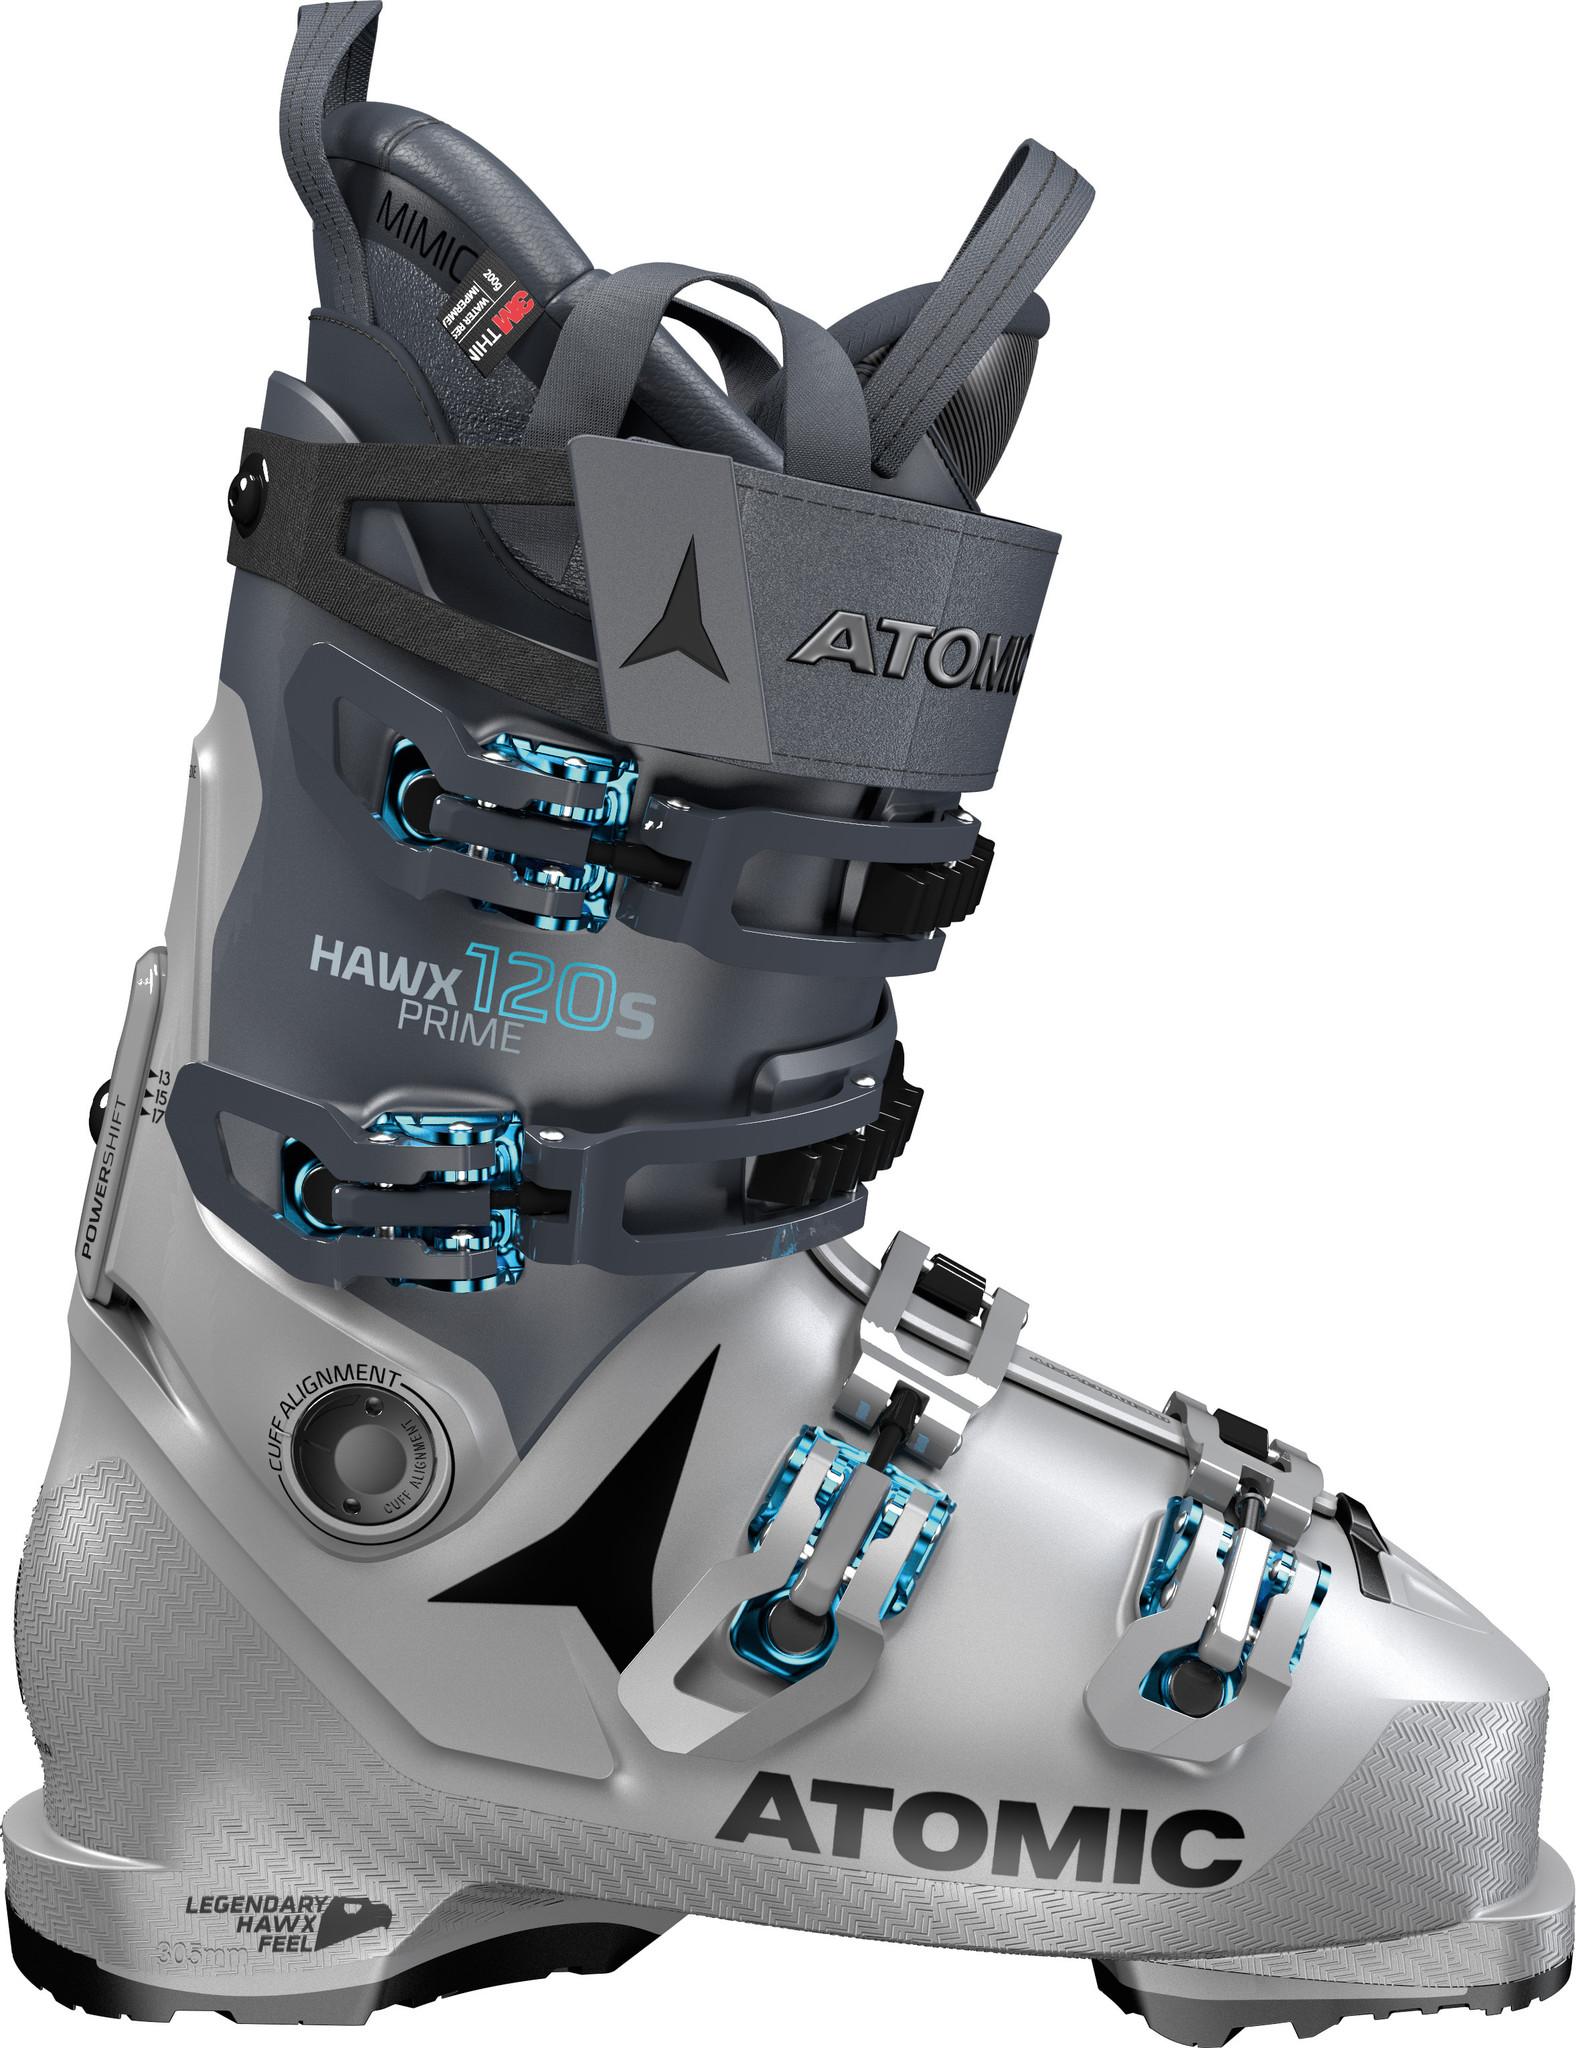 HAWX PRIME 120 S GW-1